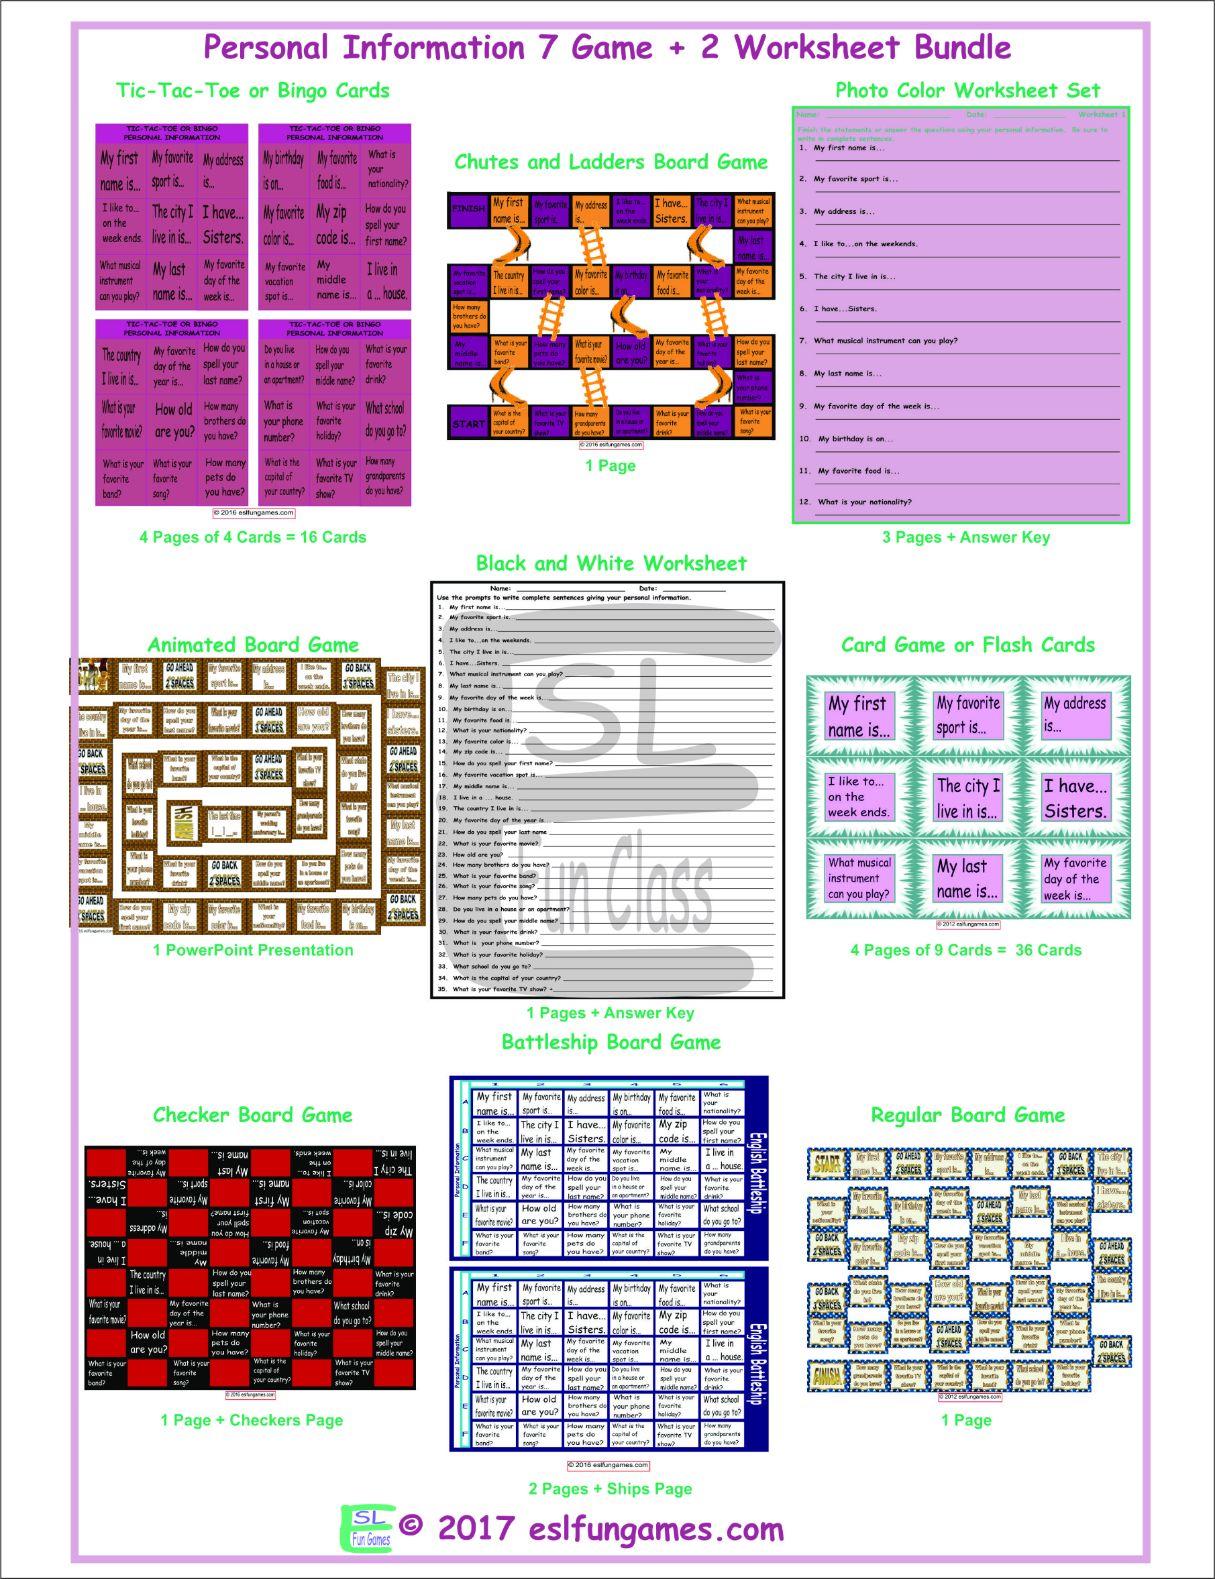 Personal Information 7 Game Plus 2 Worksheet Bundle